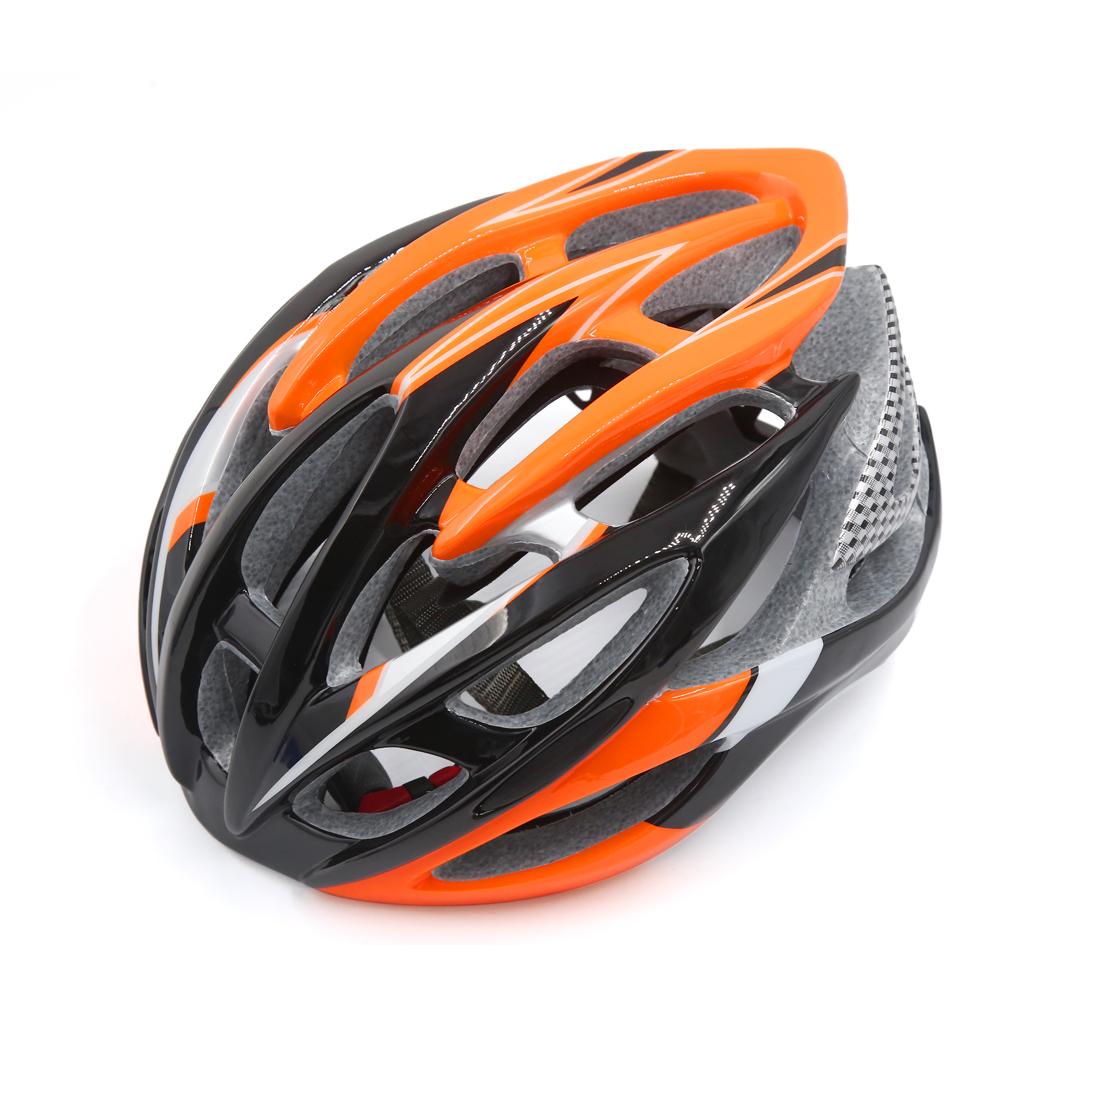 Black Orange 26 Vents EPS Adjusable Unisex Adult Helmet for Bike Bicycle Cycling